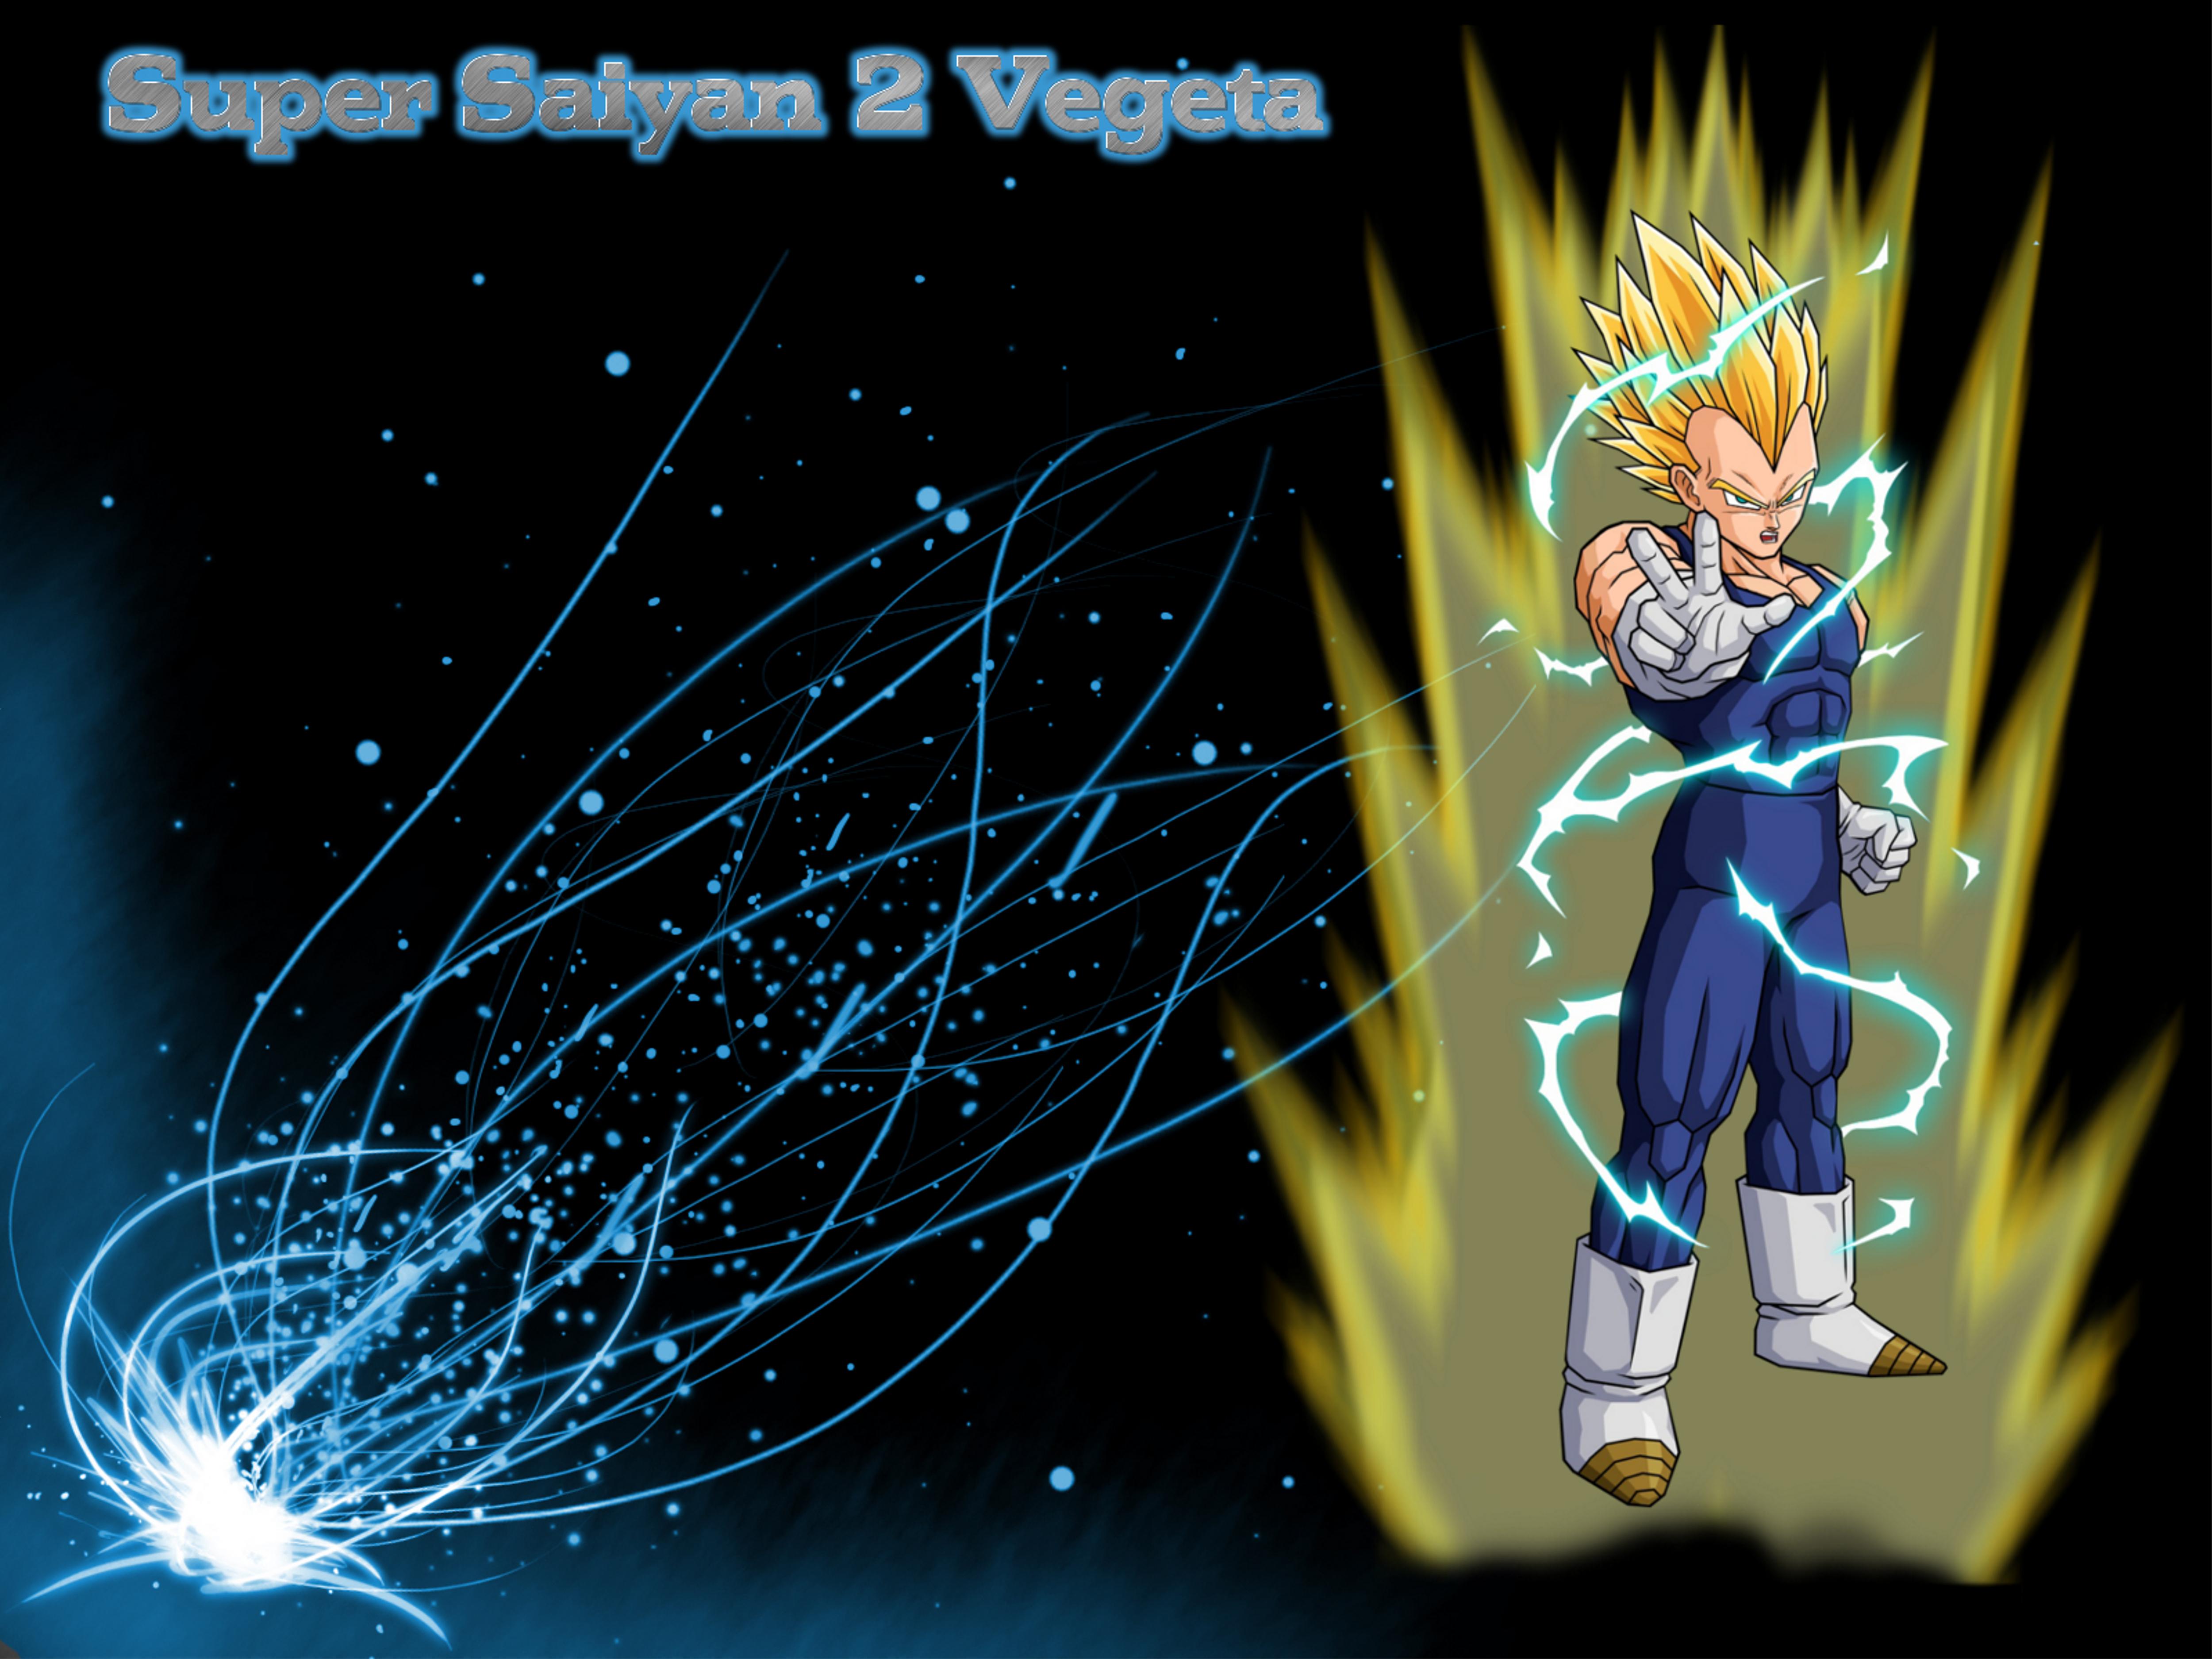 Super Vegeta Wallpaper hd Super Saiyan Vegeta Wallpaper 5000x3750